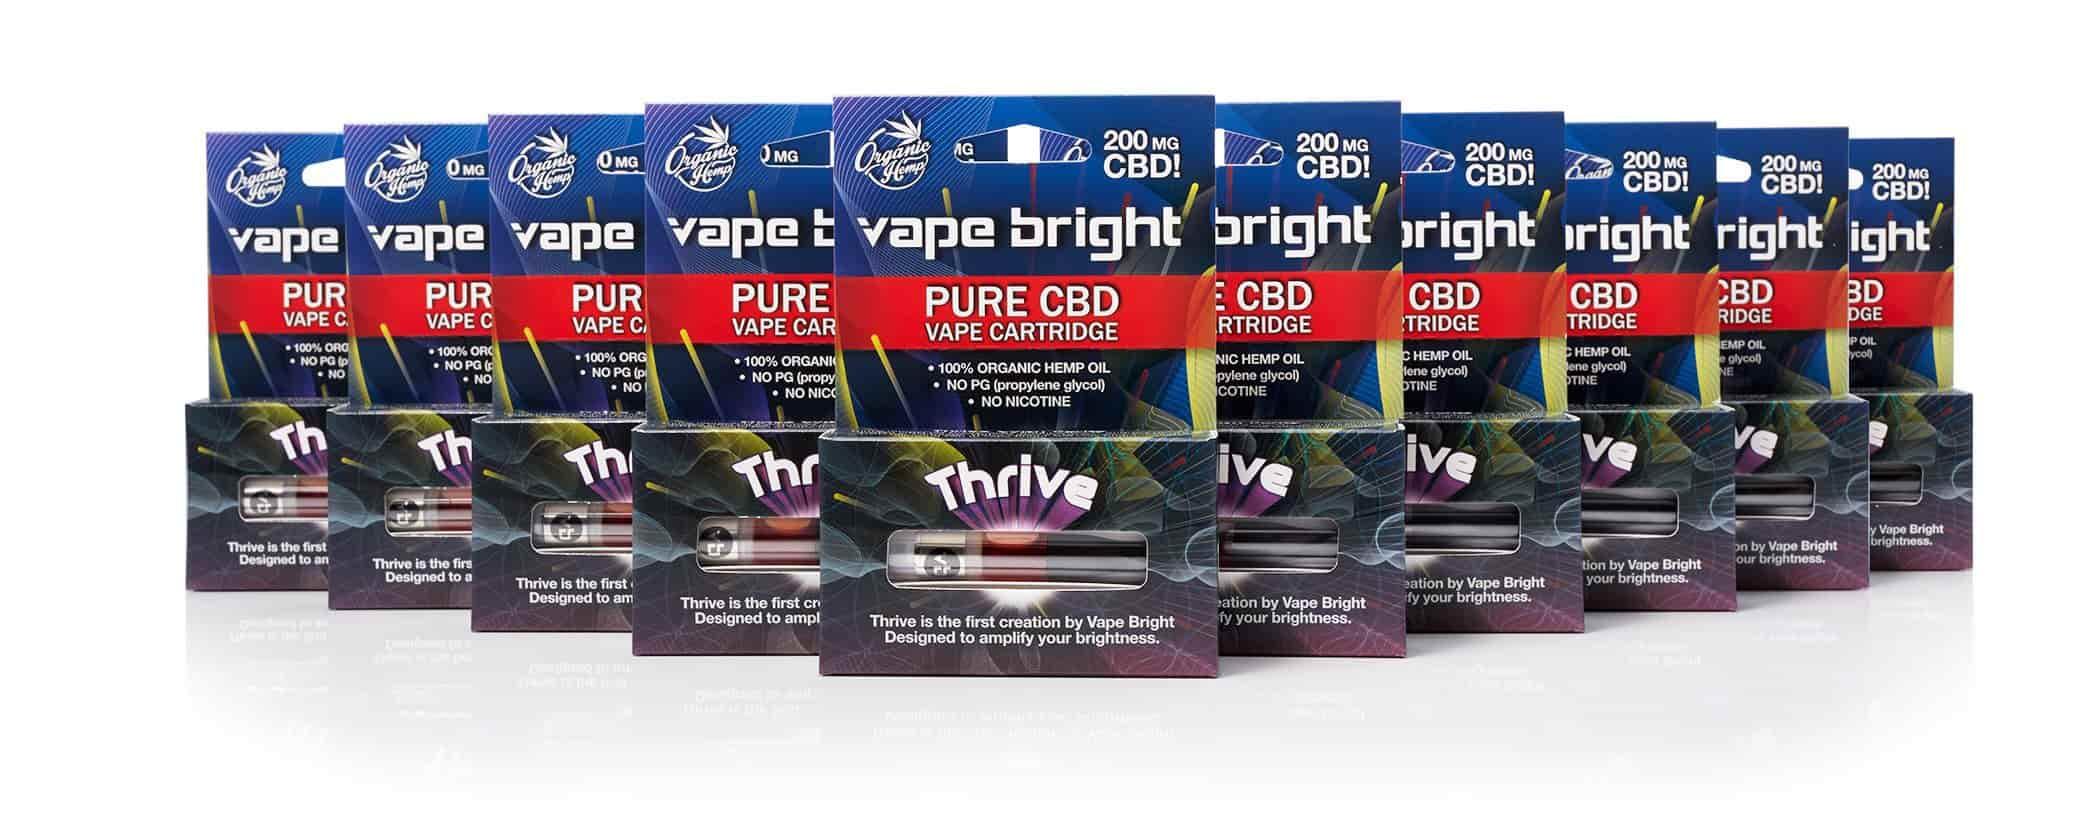 where can i buy vape bright cbd oil?